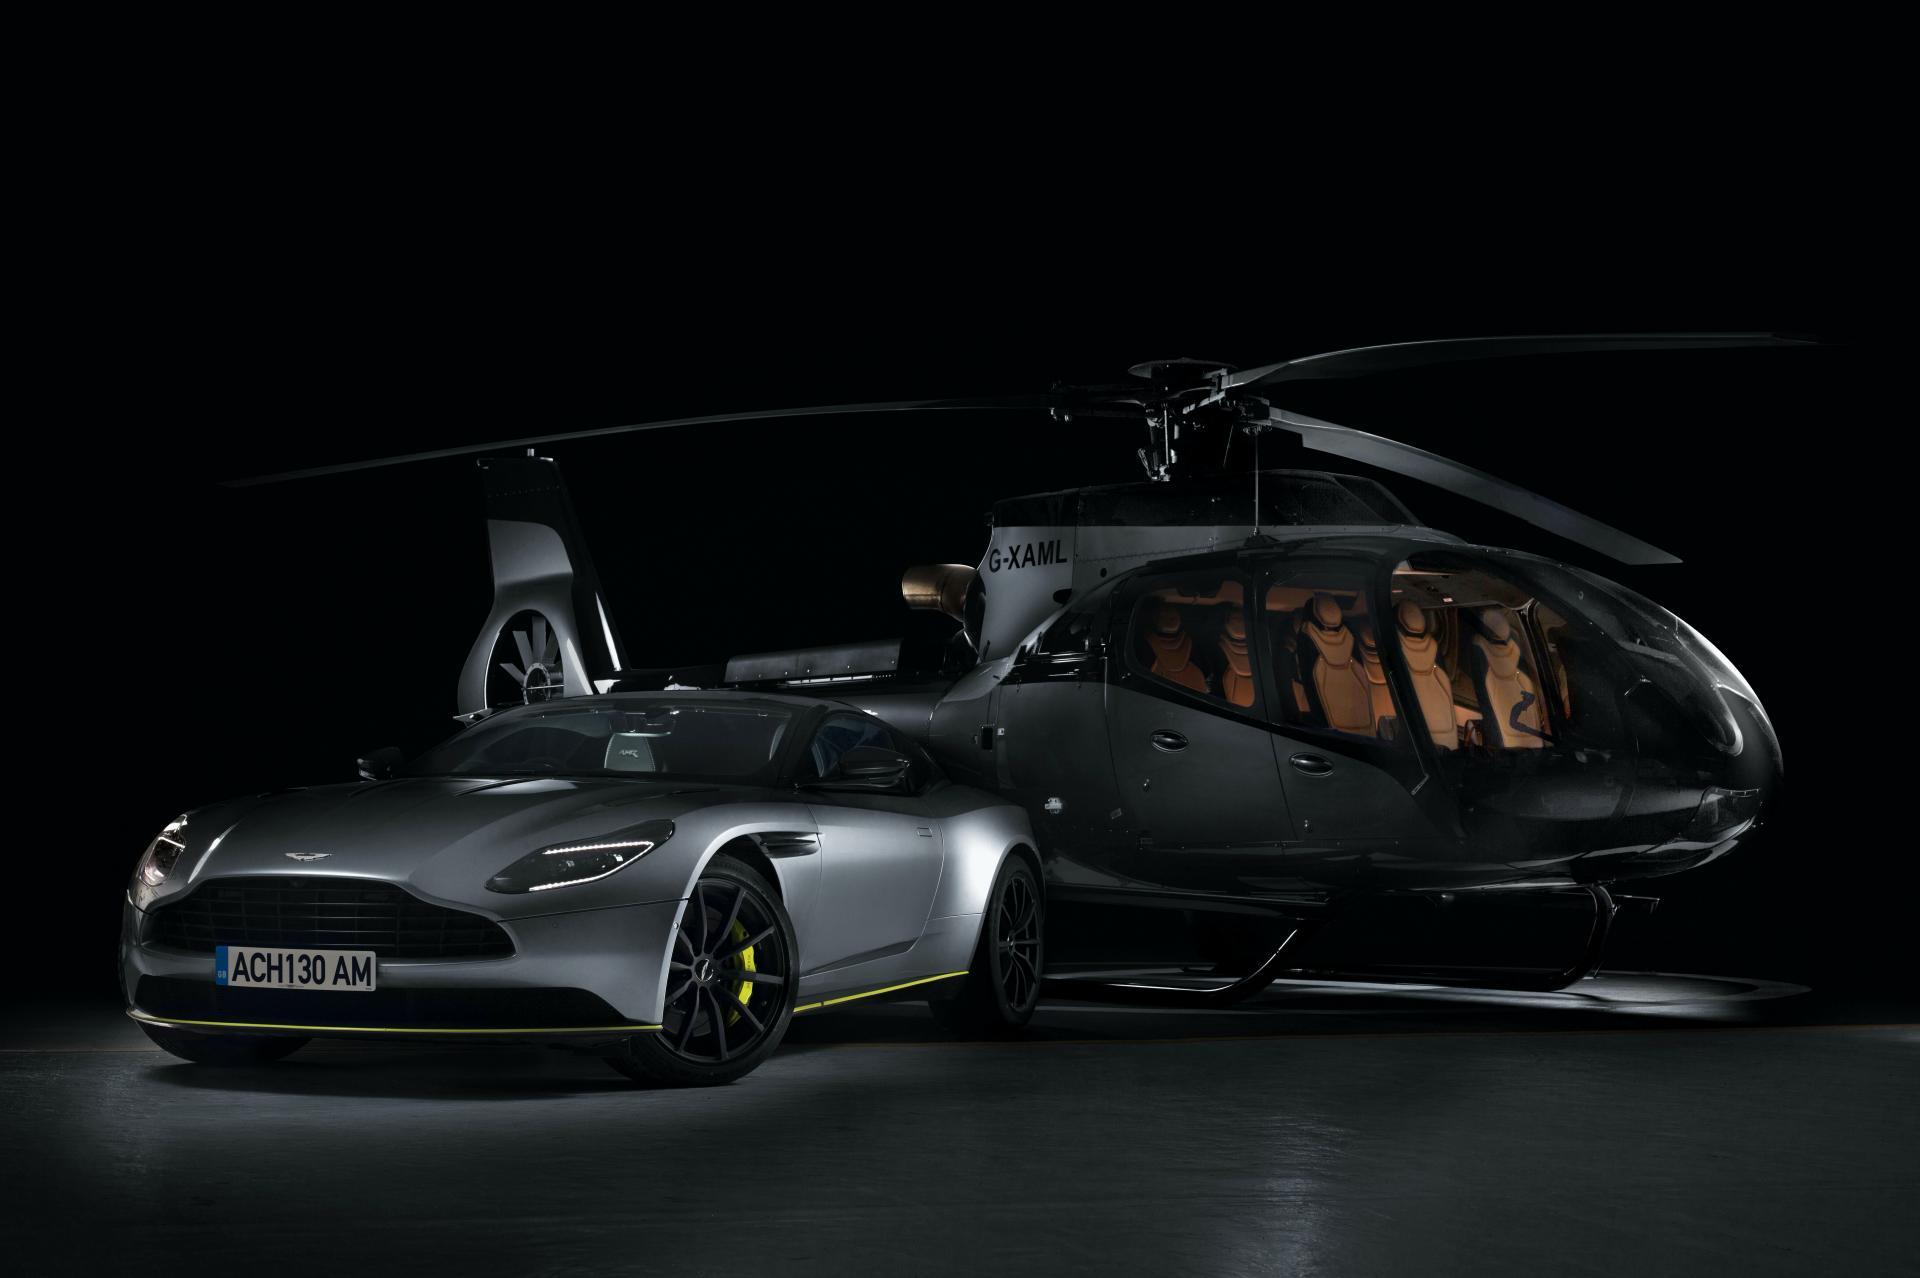 Helicoptero Ach130 Aston Martin Edition (2)